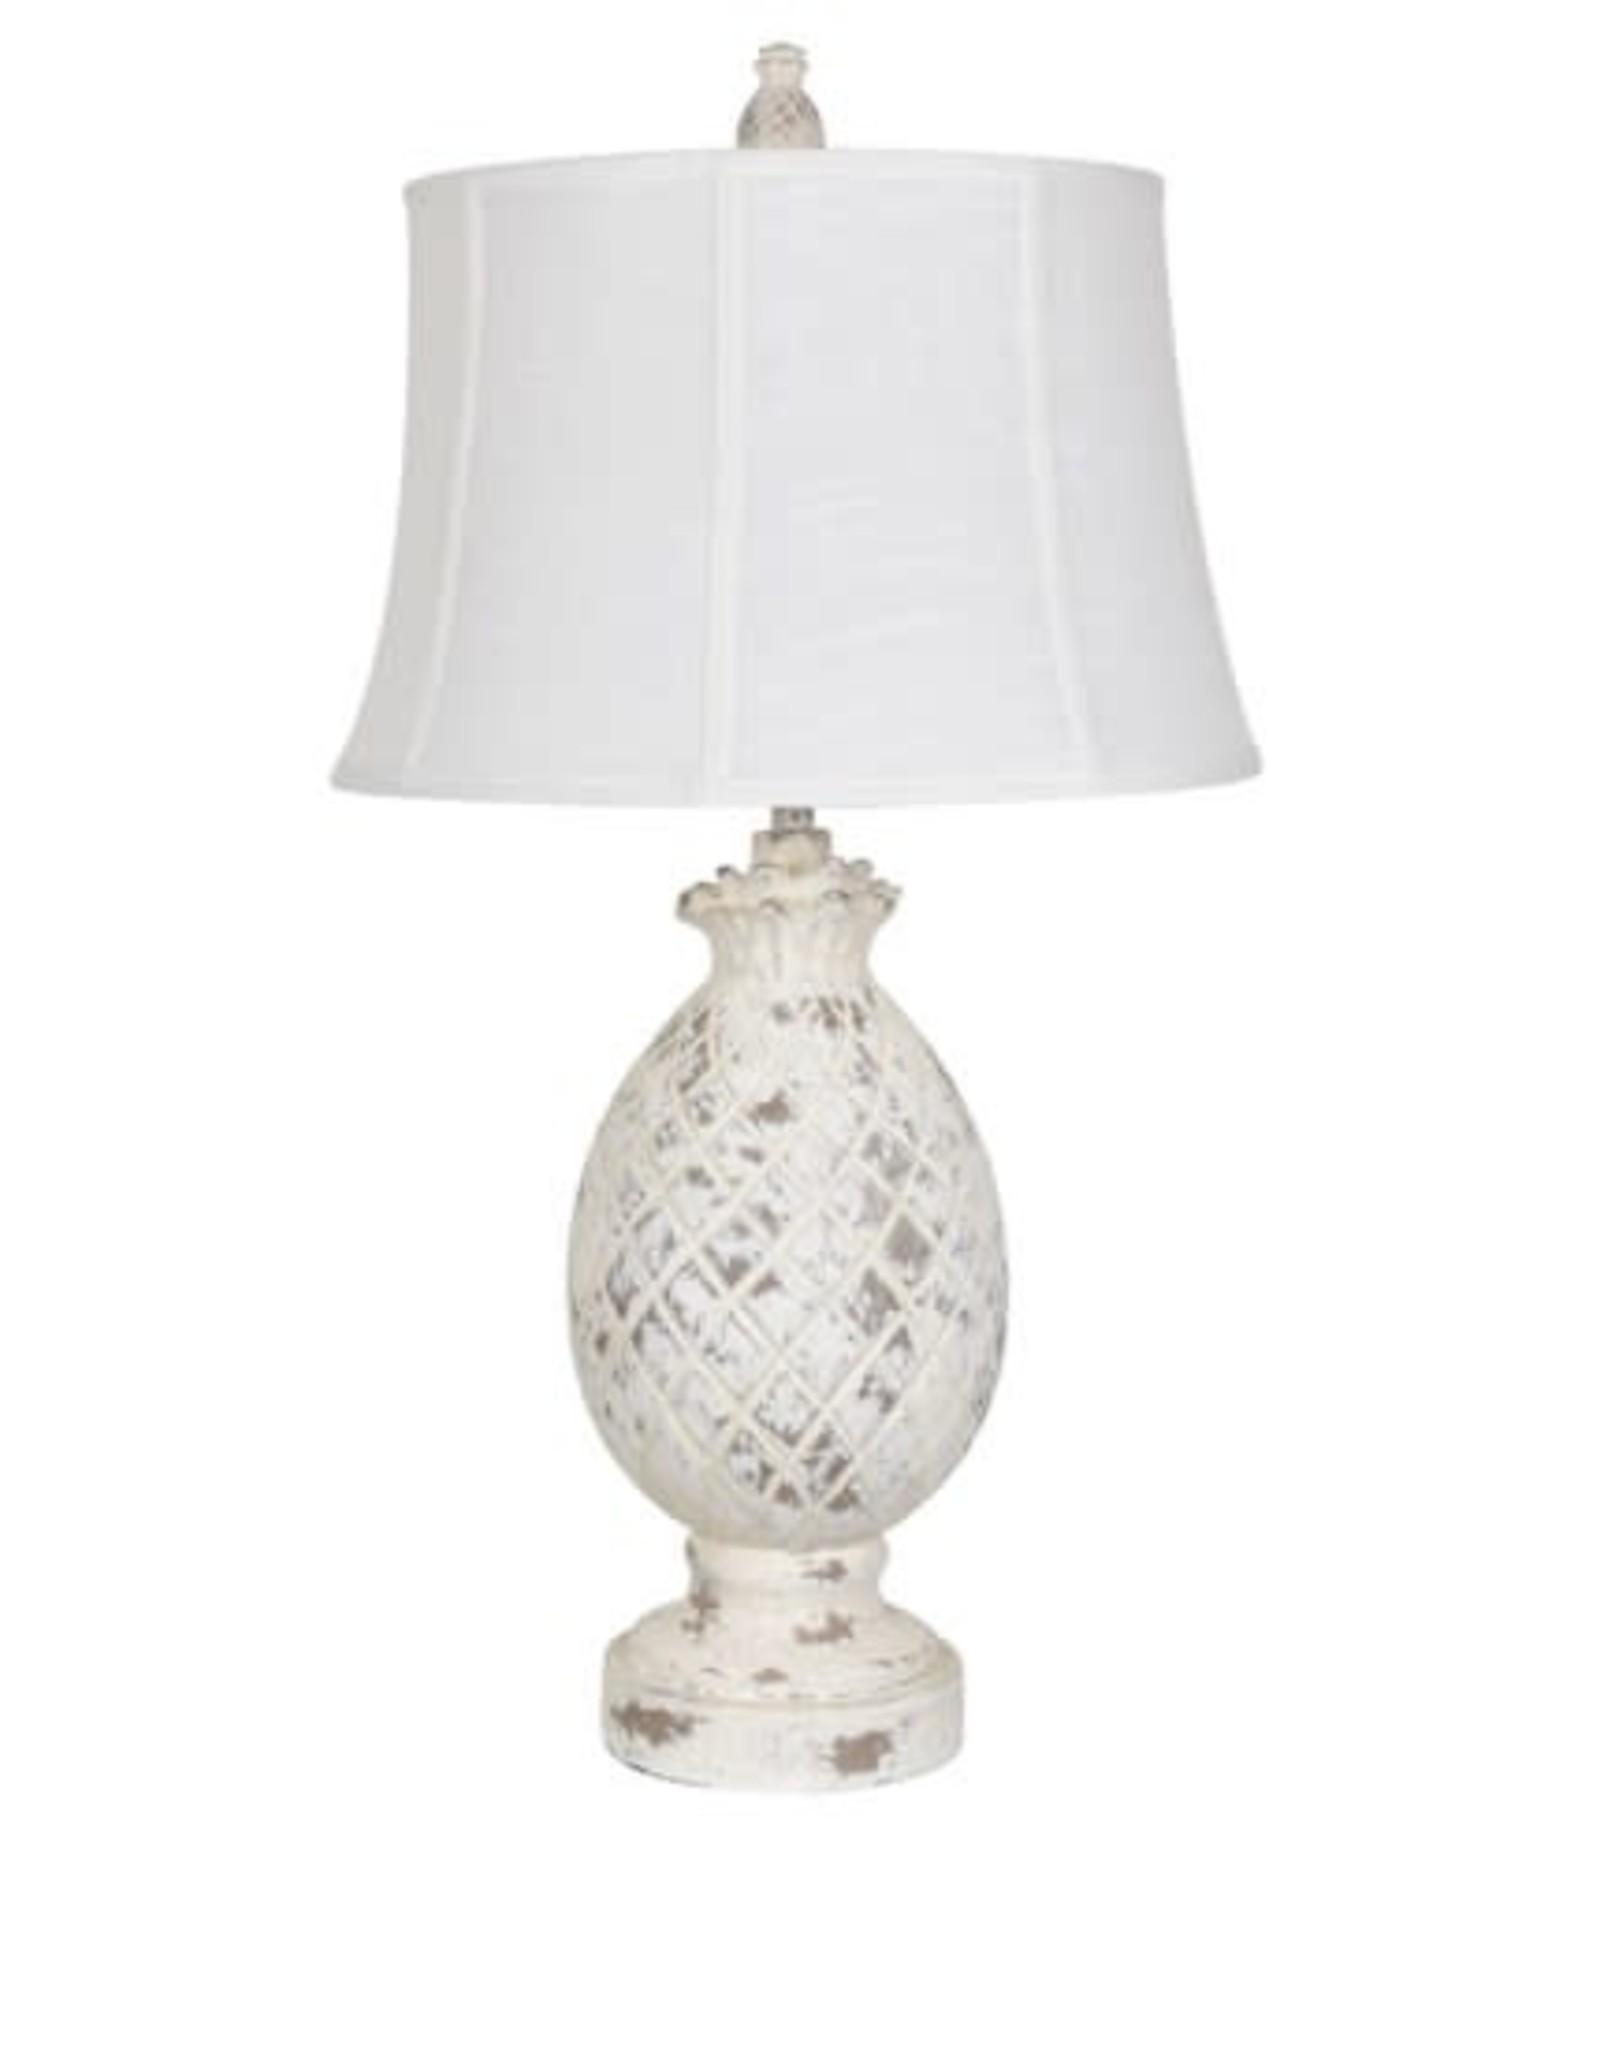 Crestview Pineapple Table Lamp